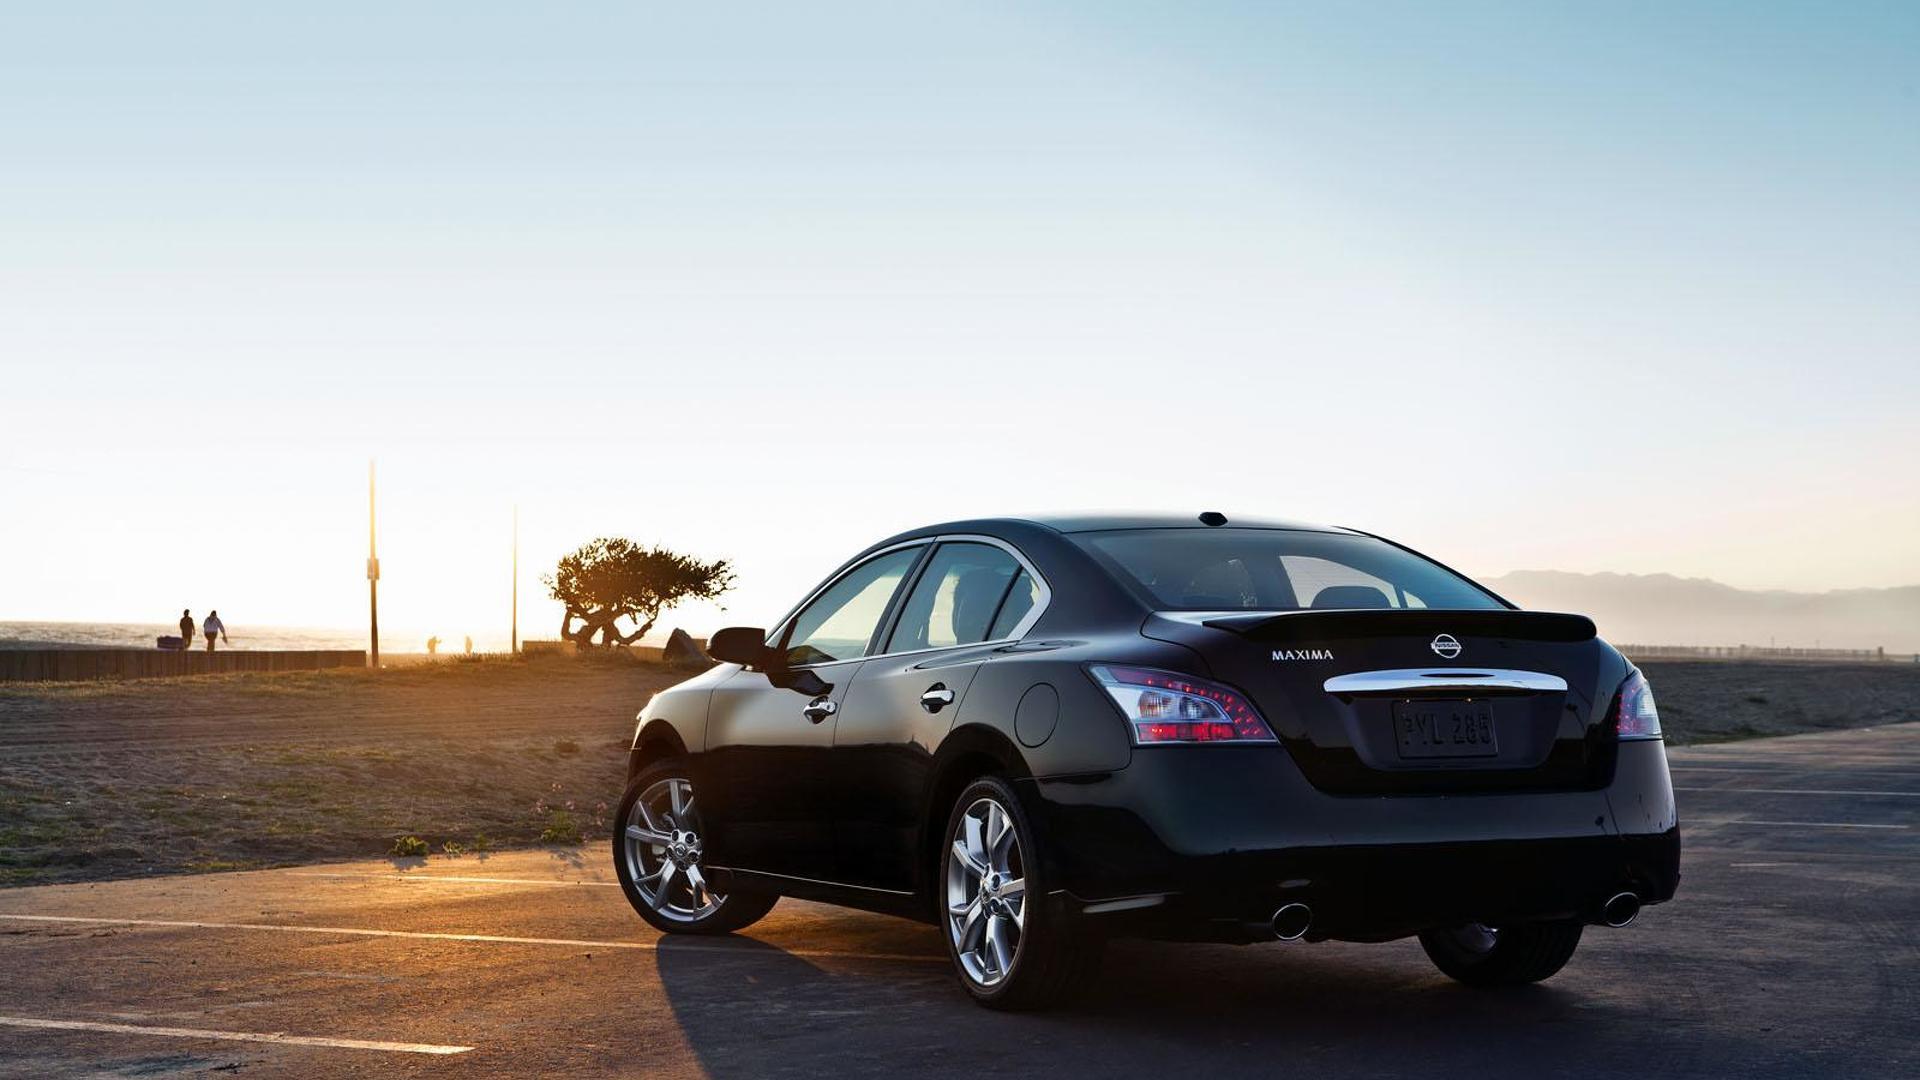 2012 Nissan Maxima gets a nip/tuck